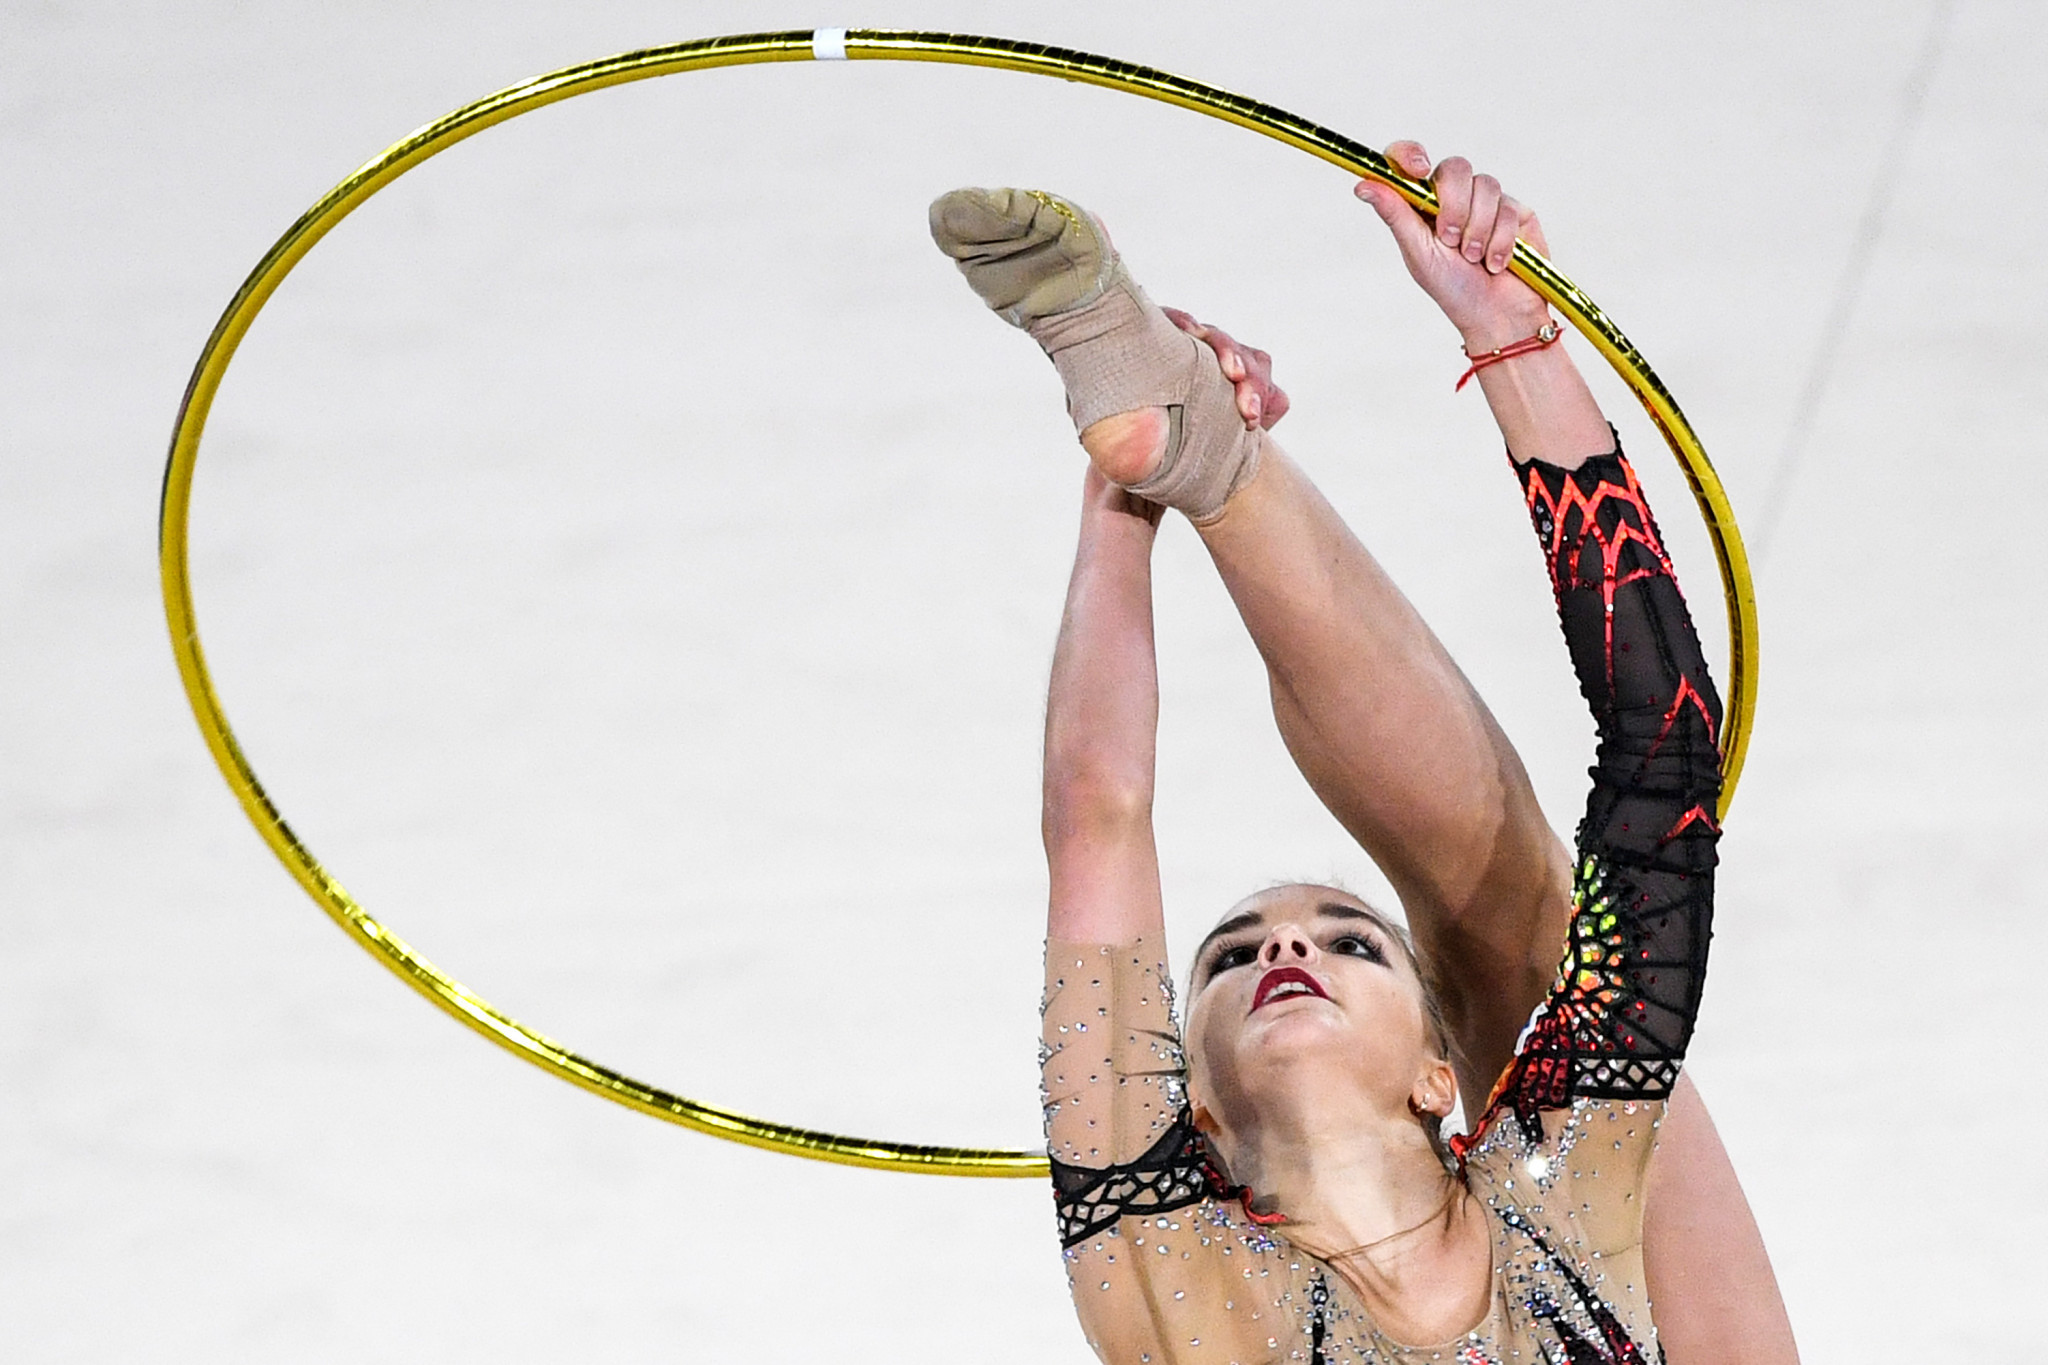 Averina twins dominate Rhythmic Gymnastics World Cup in Tashkent